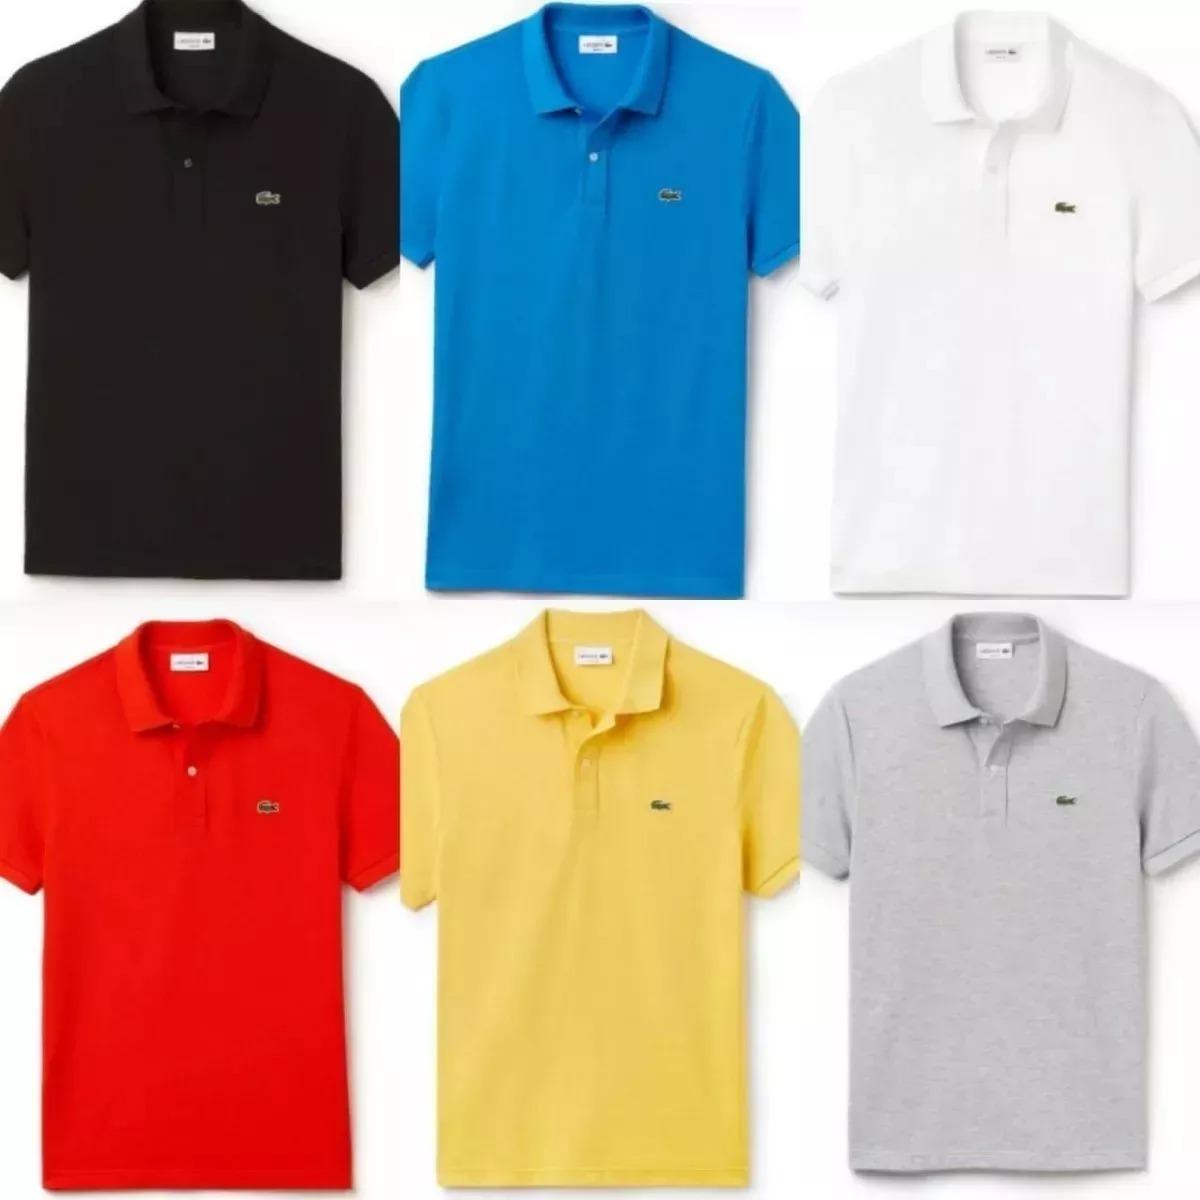 oferta kit 5 camisas camiseta gola polo masculina lacoste. Carregando zoom. f53858b2a2